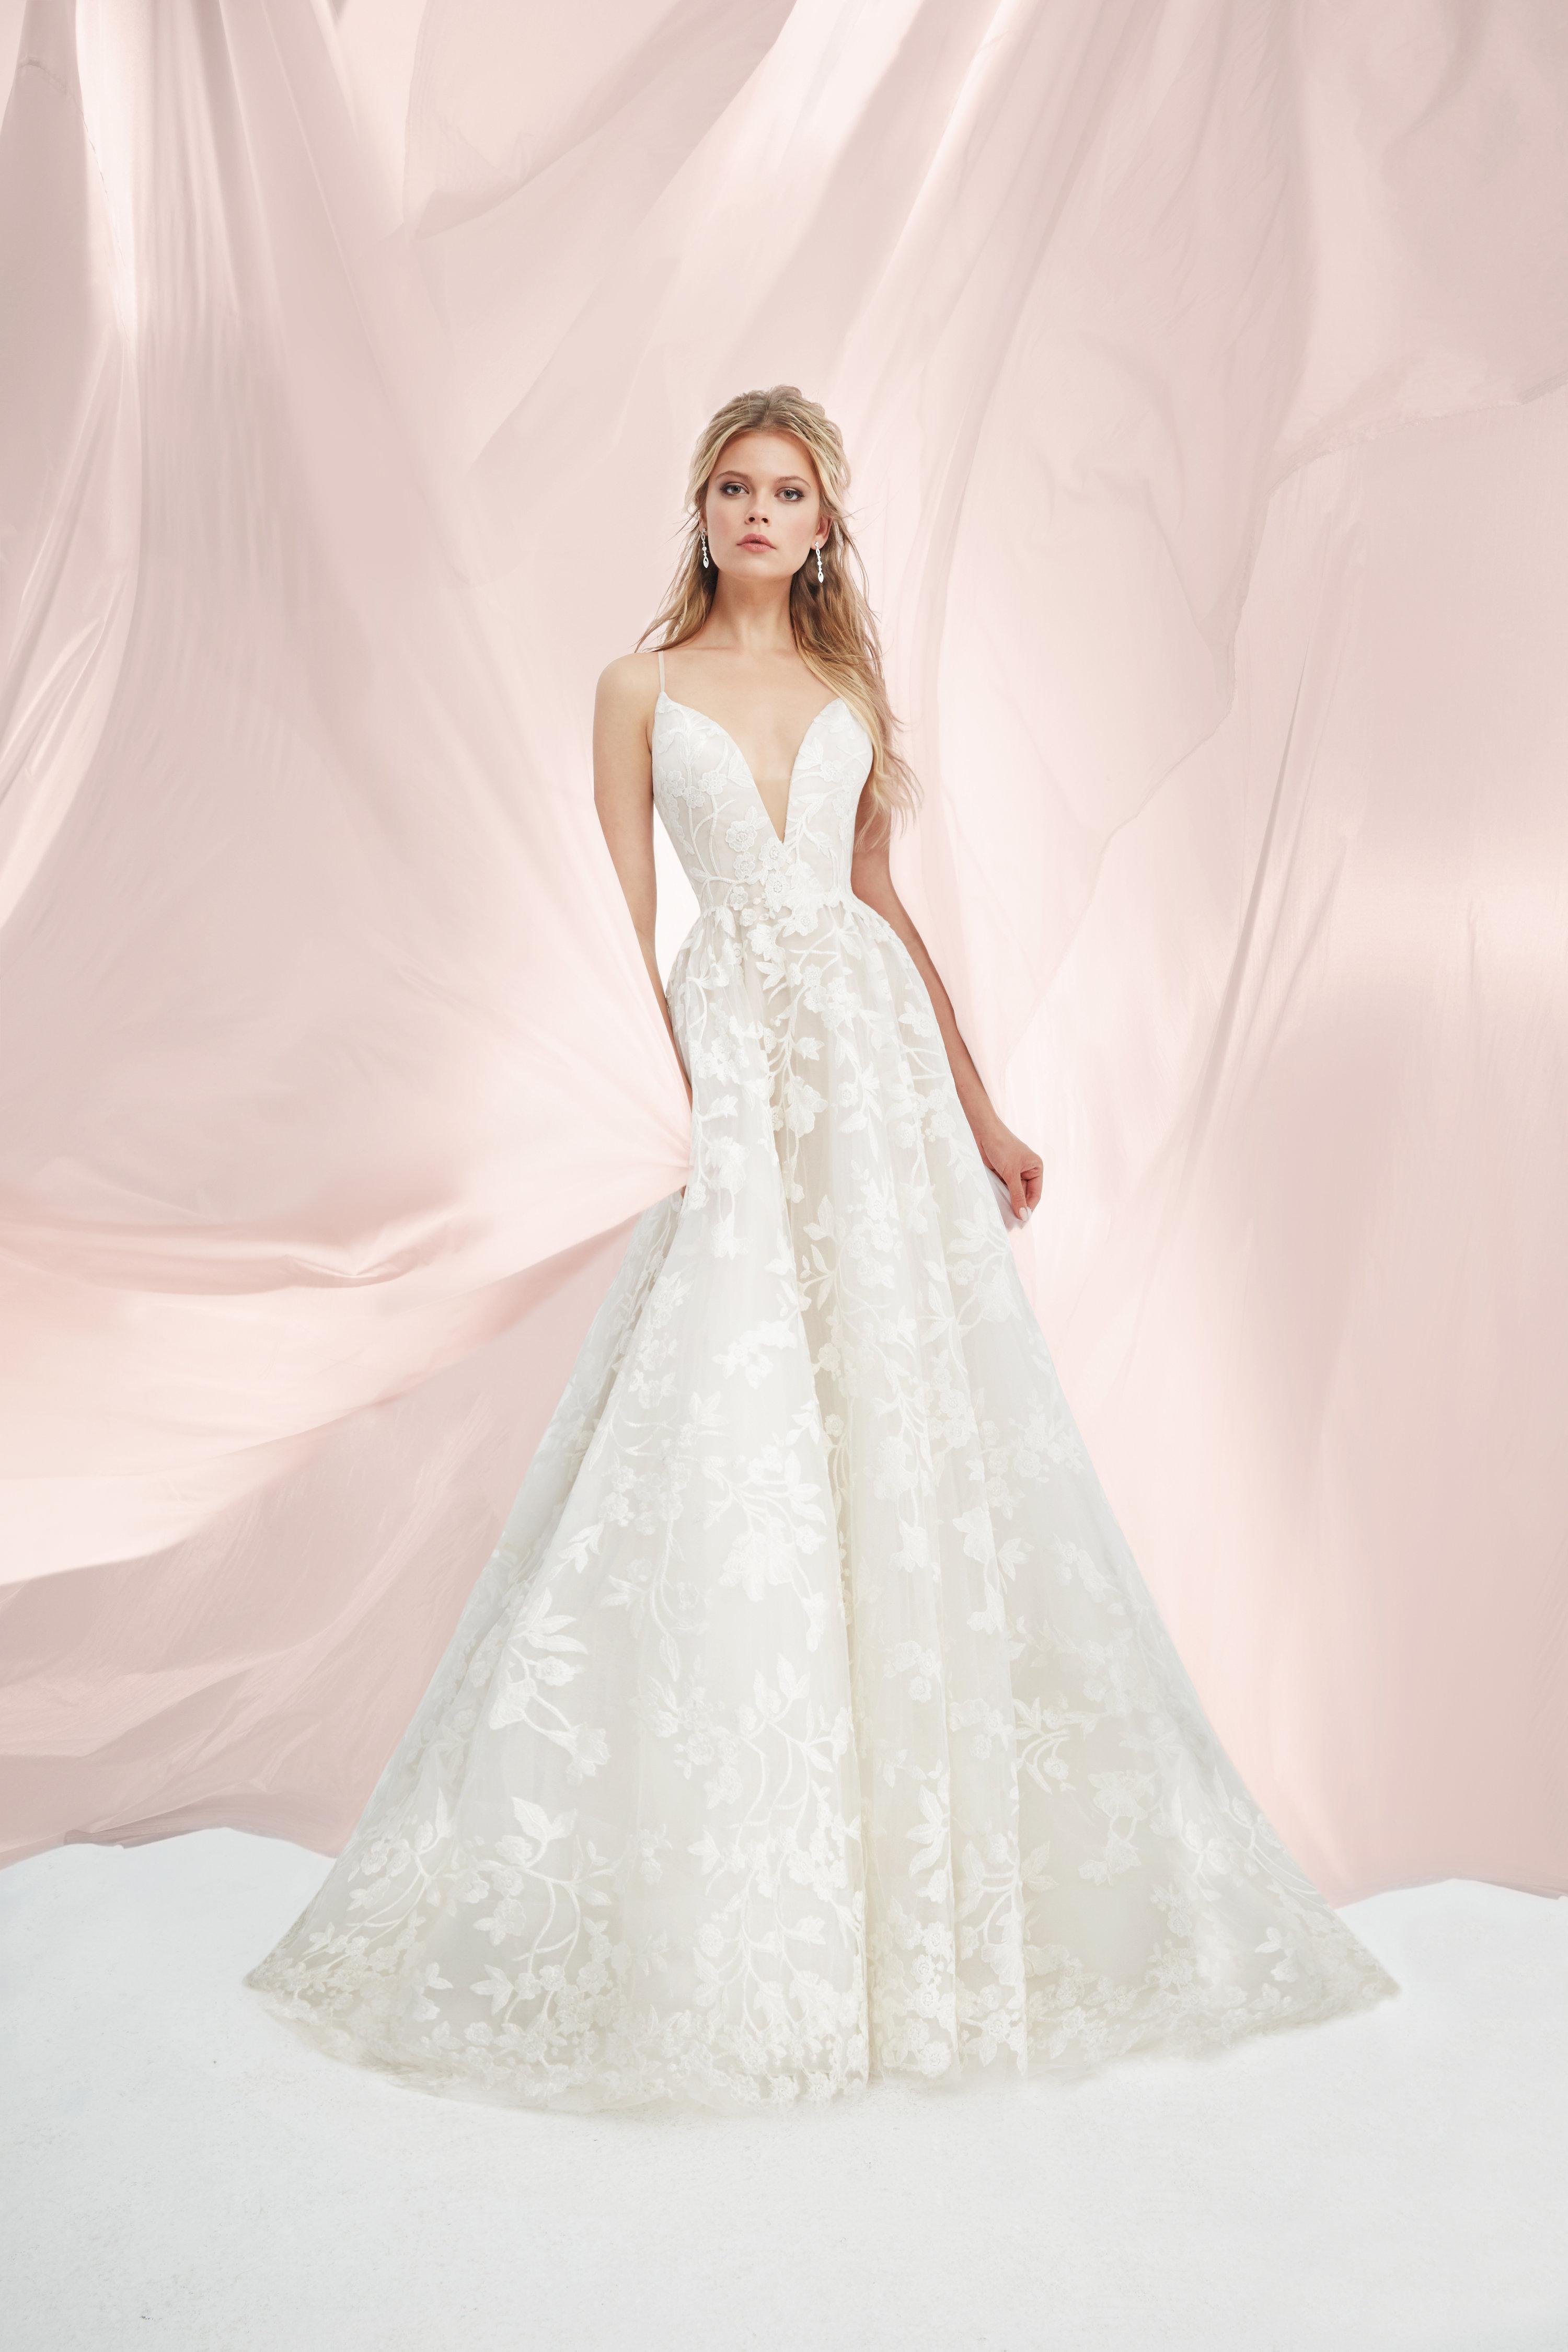 Modern Fit And Flare Wedding Dress | Kleinfeld Bridal